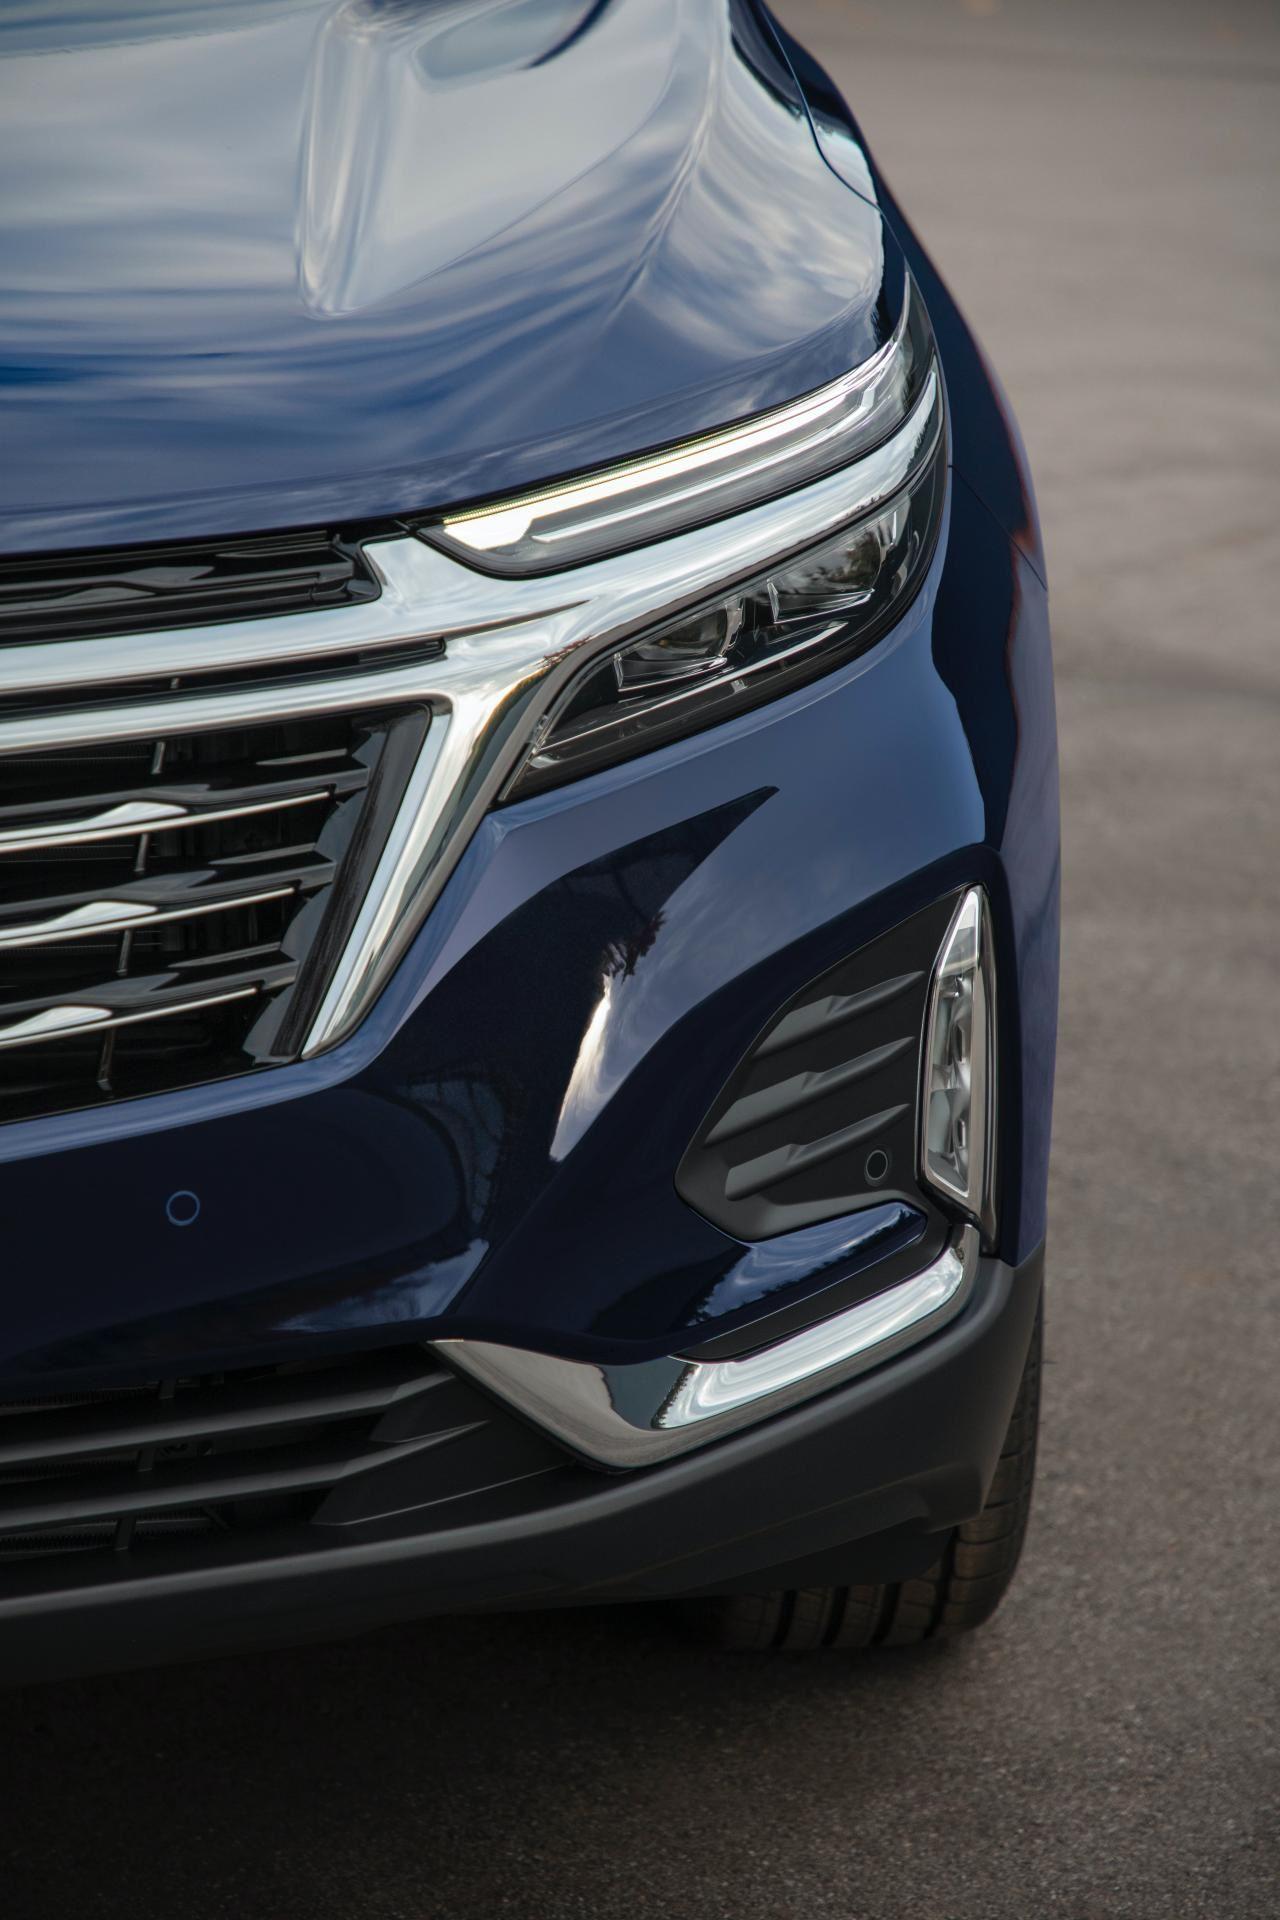 Chevrolet-Equinox-facelift-2020-16